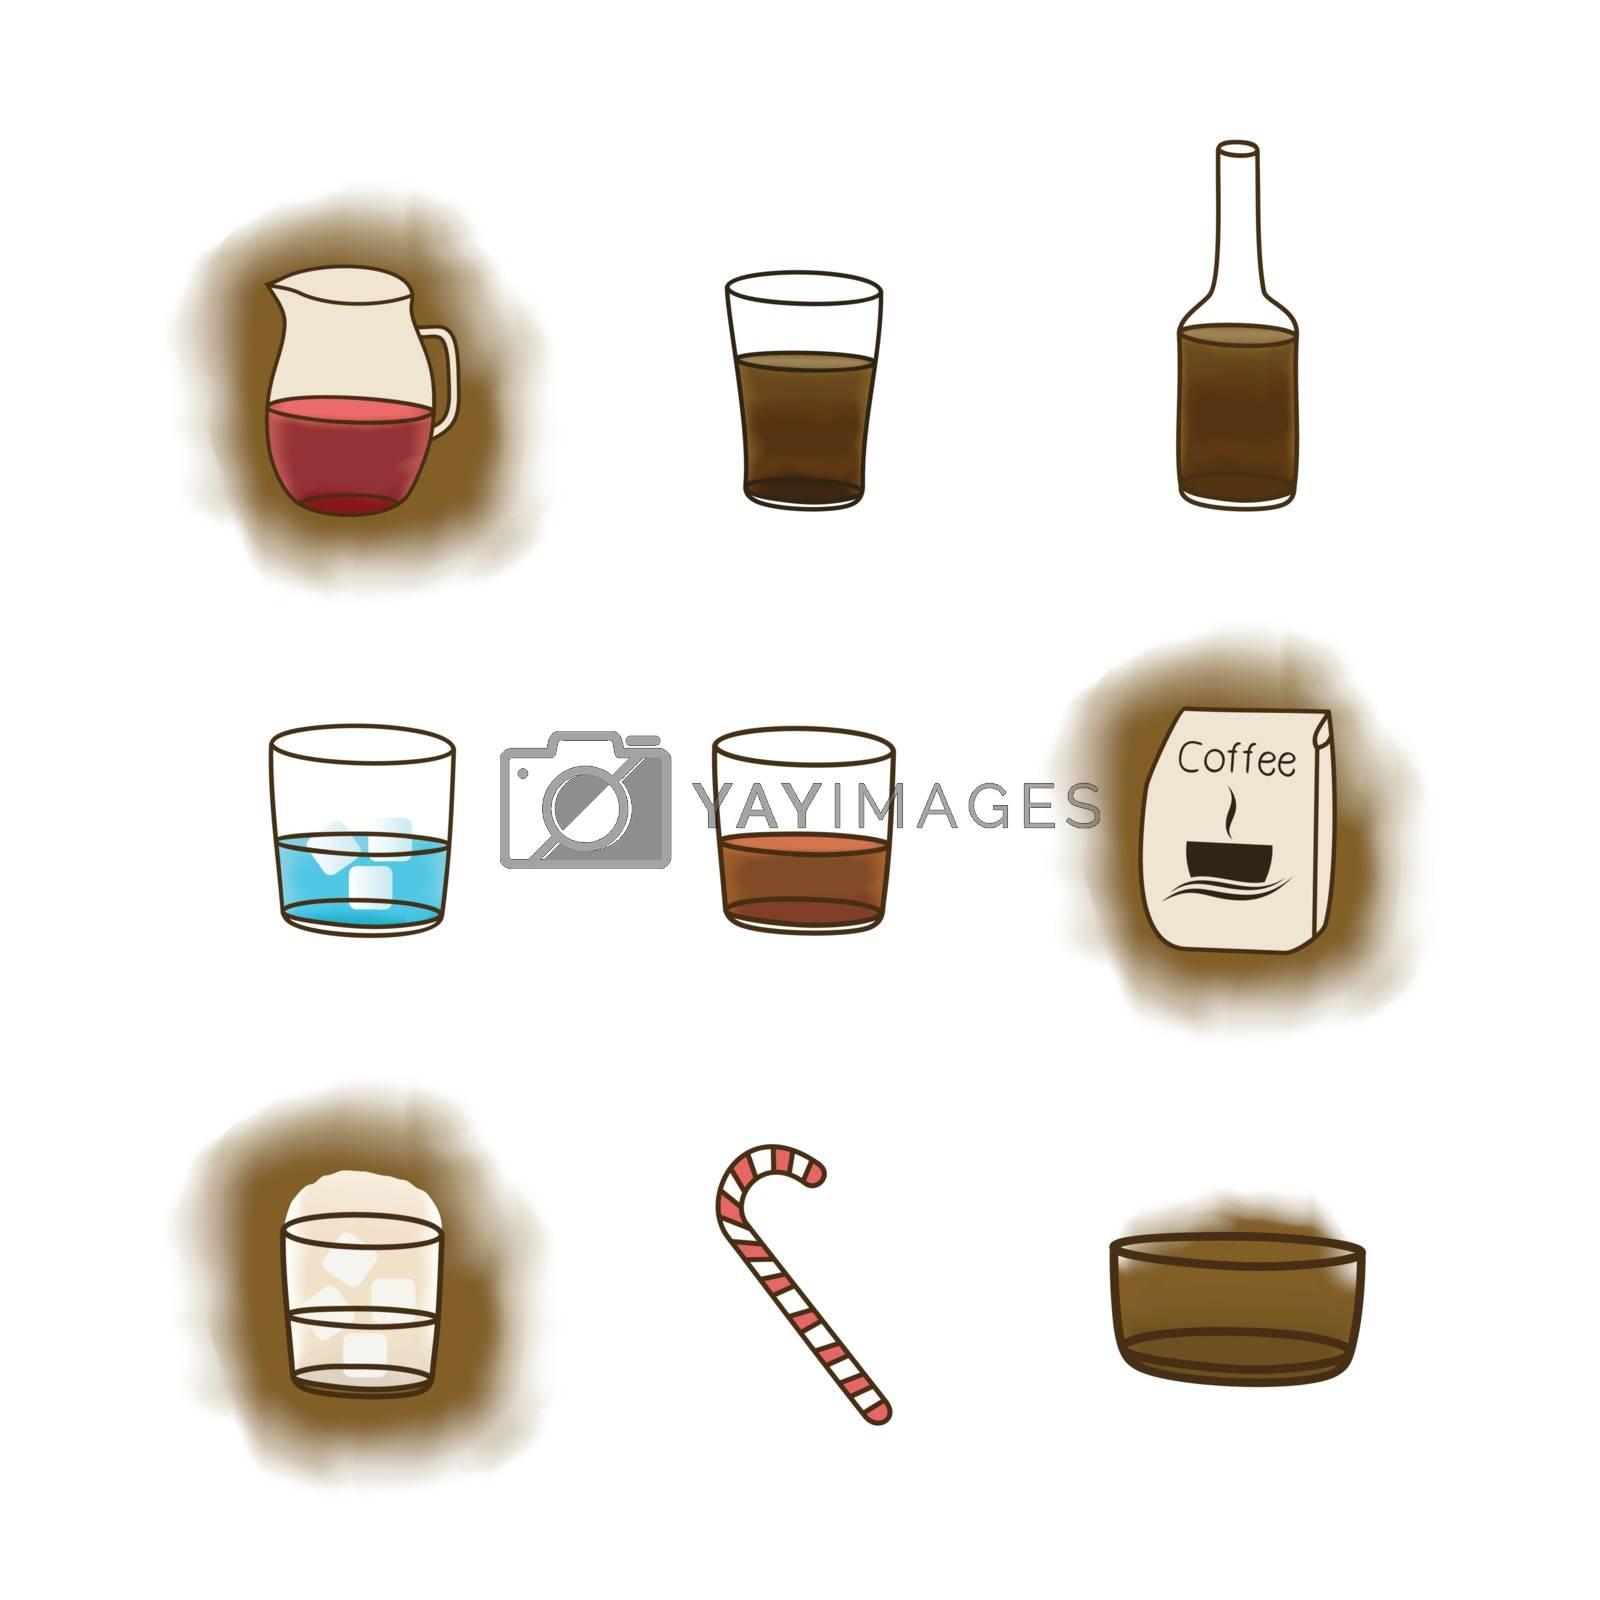 Coffee icon3 by aleksander1